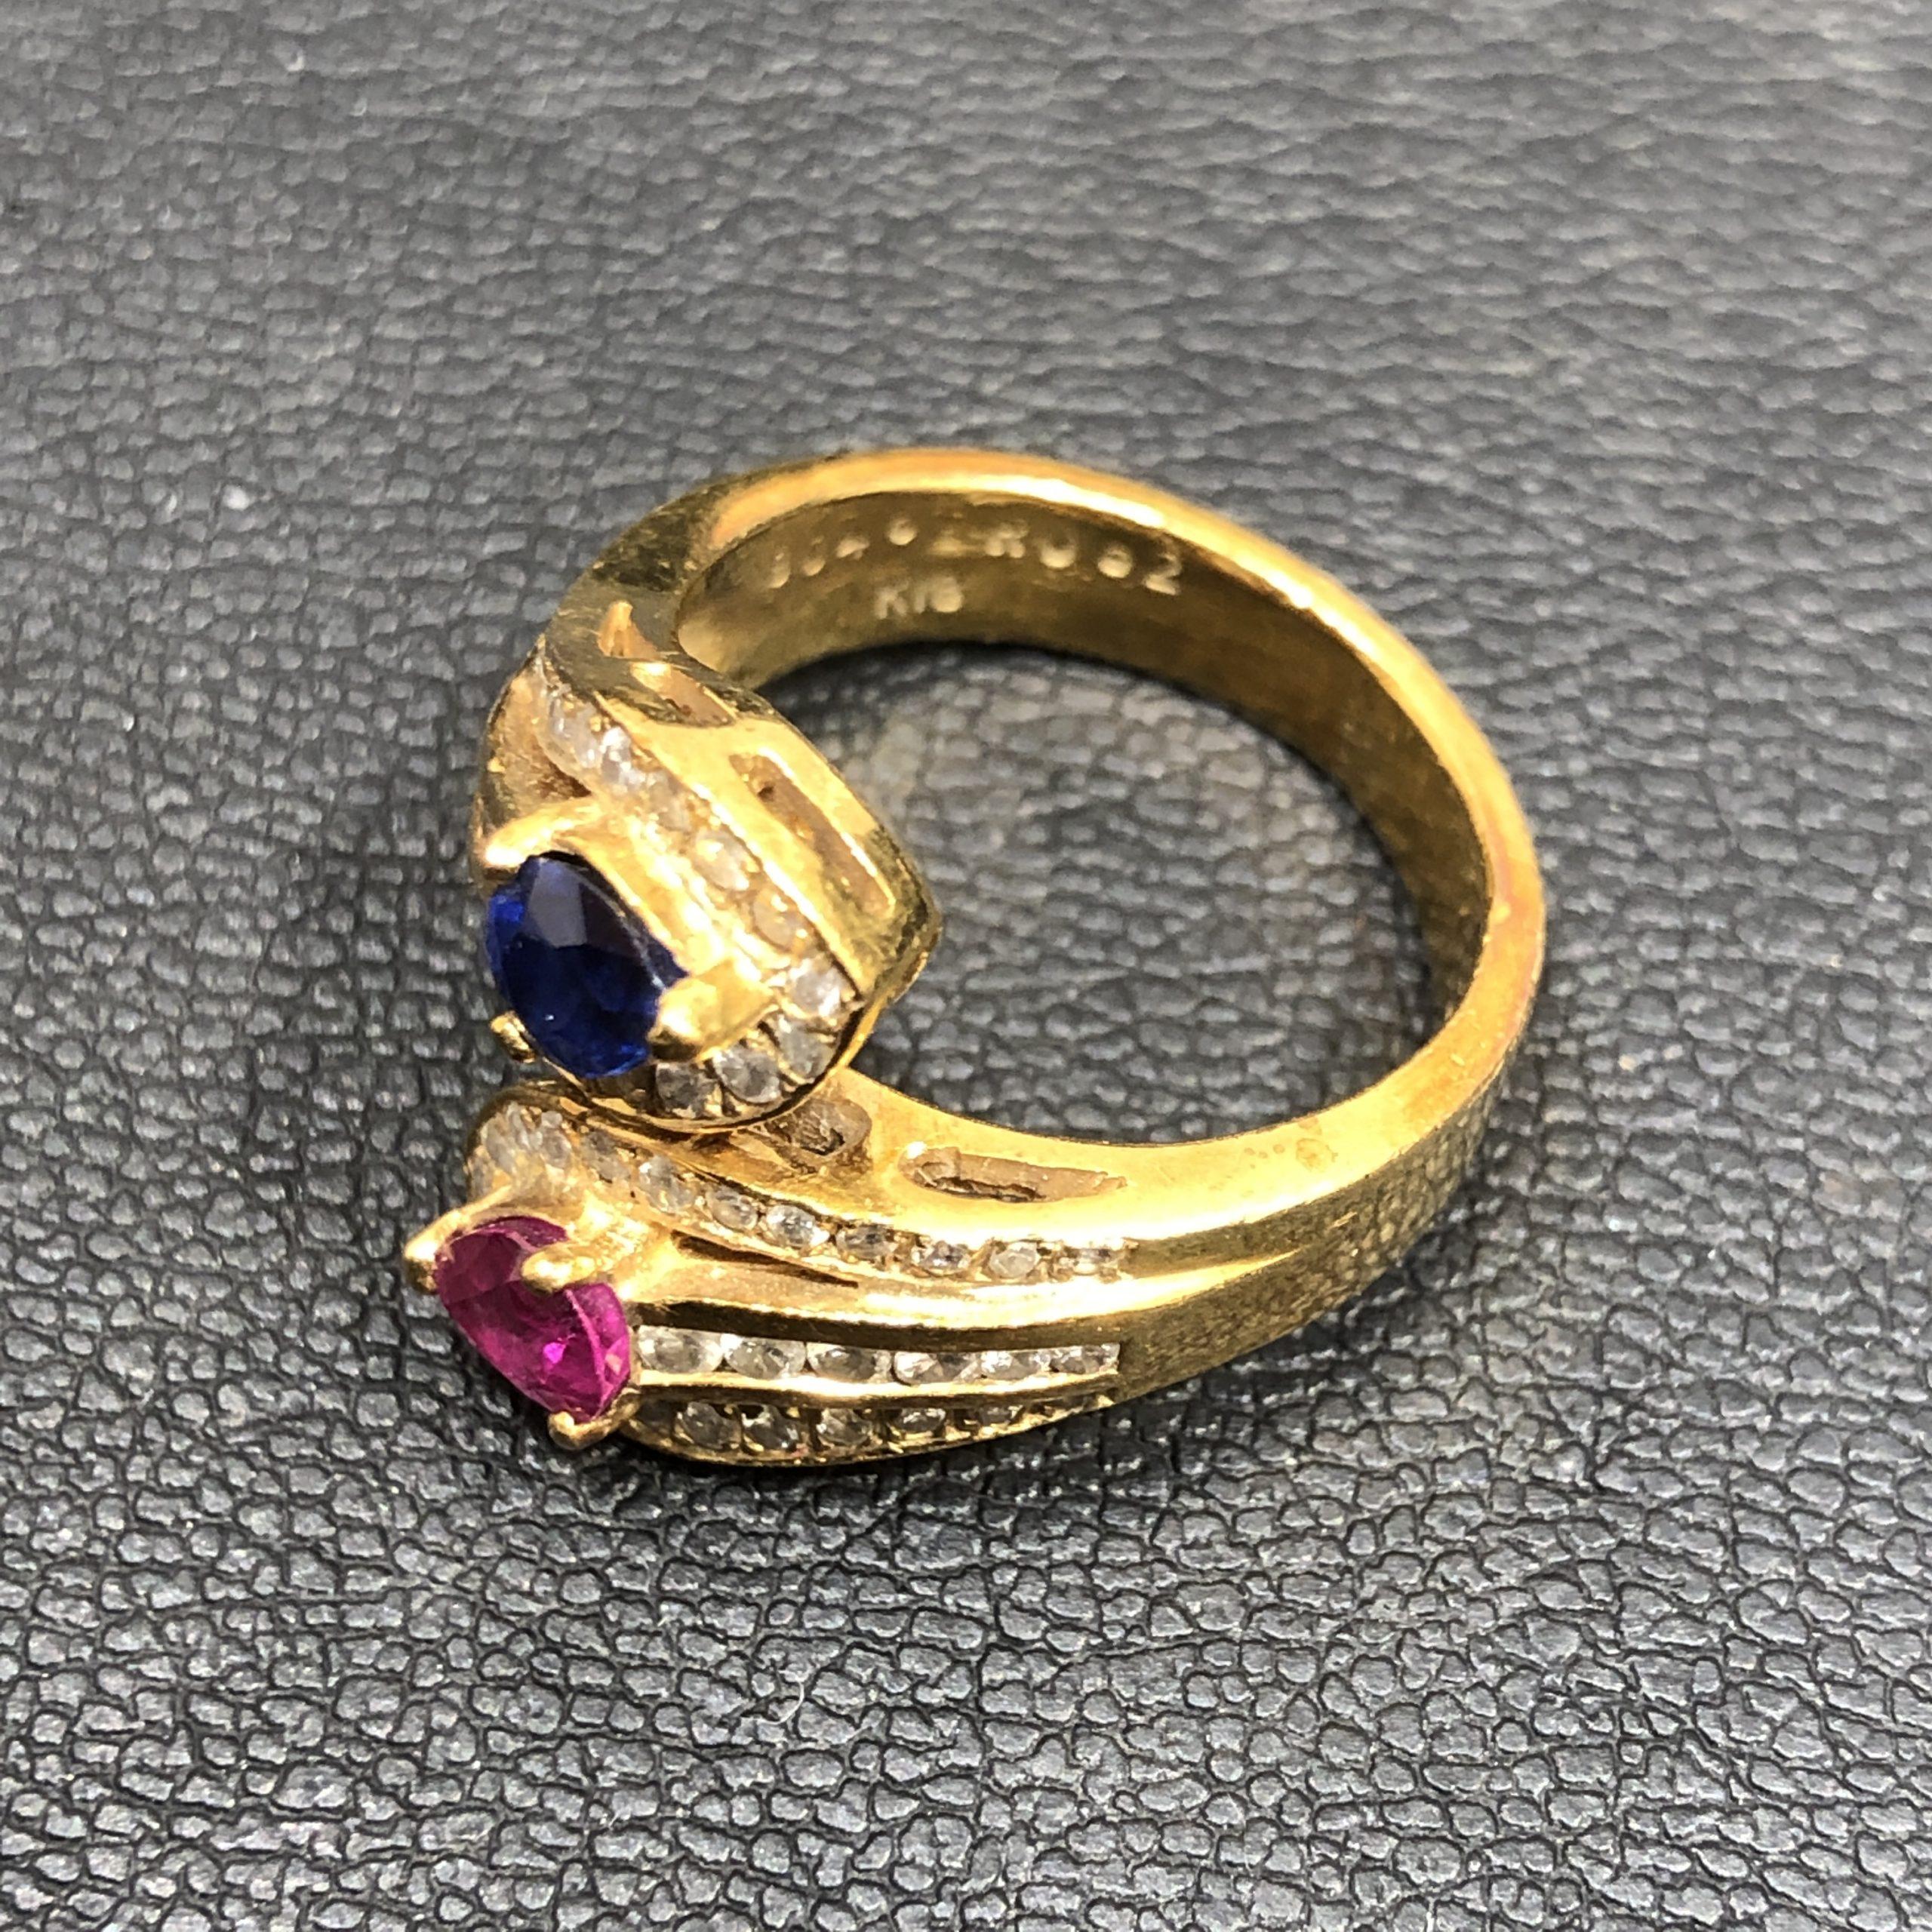 【K18/18金】サファイア0.4ct ルビー0.52ct MD0.47ct 指輪